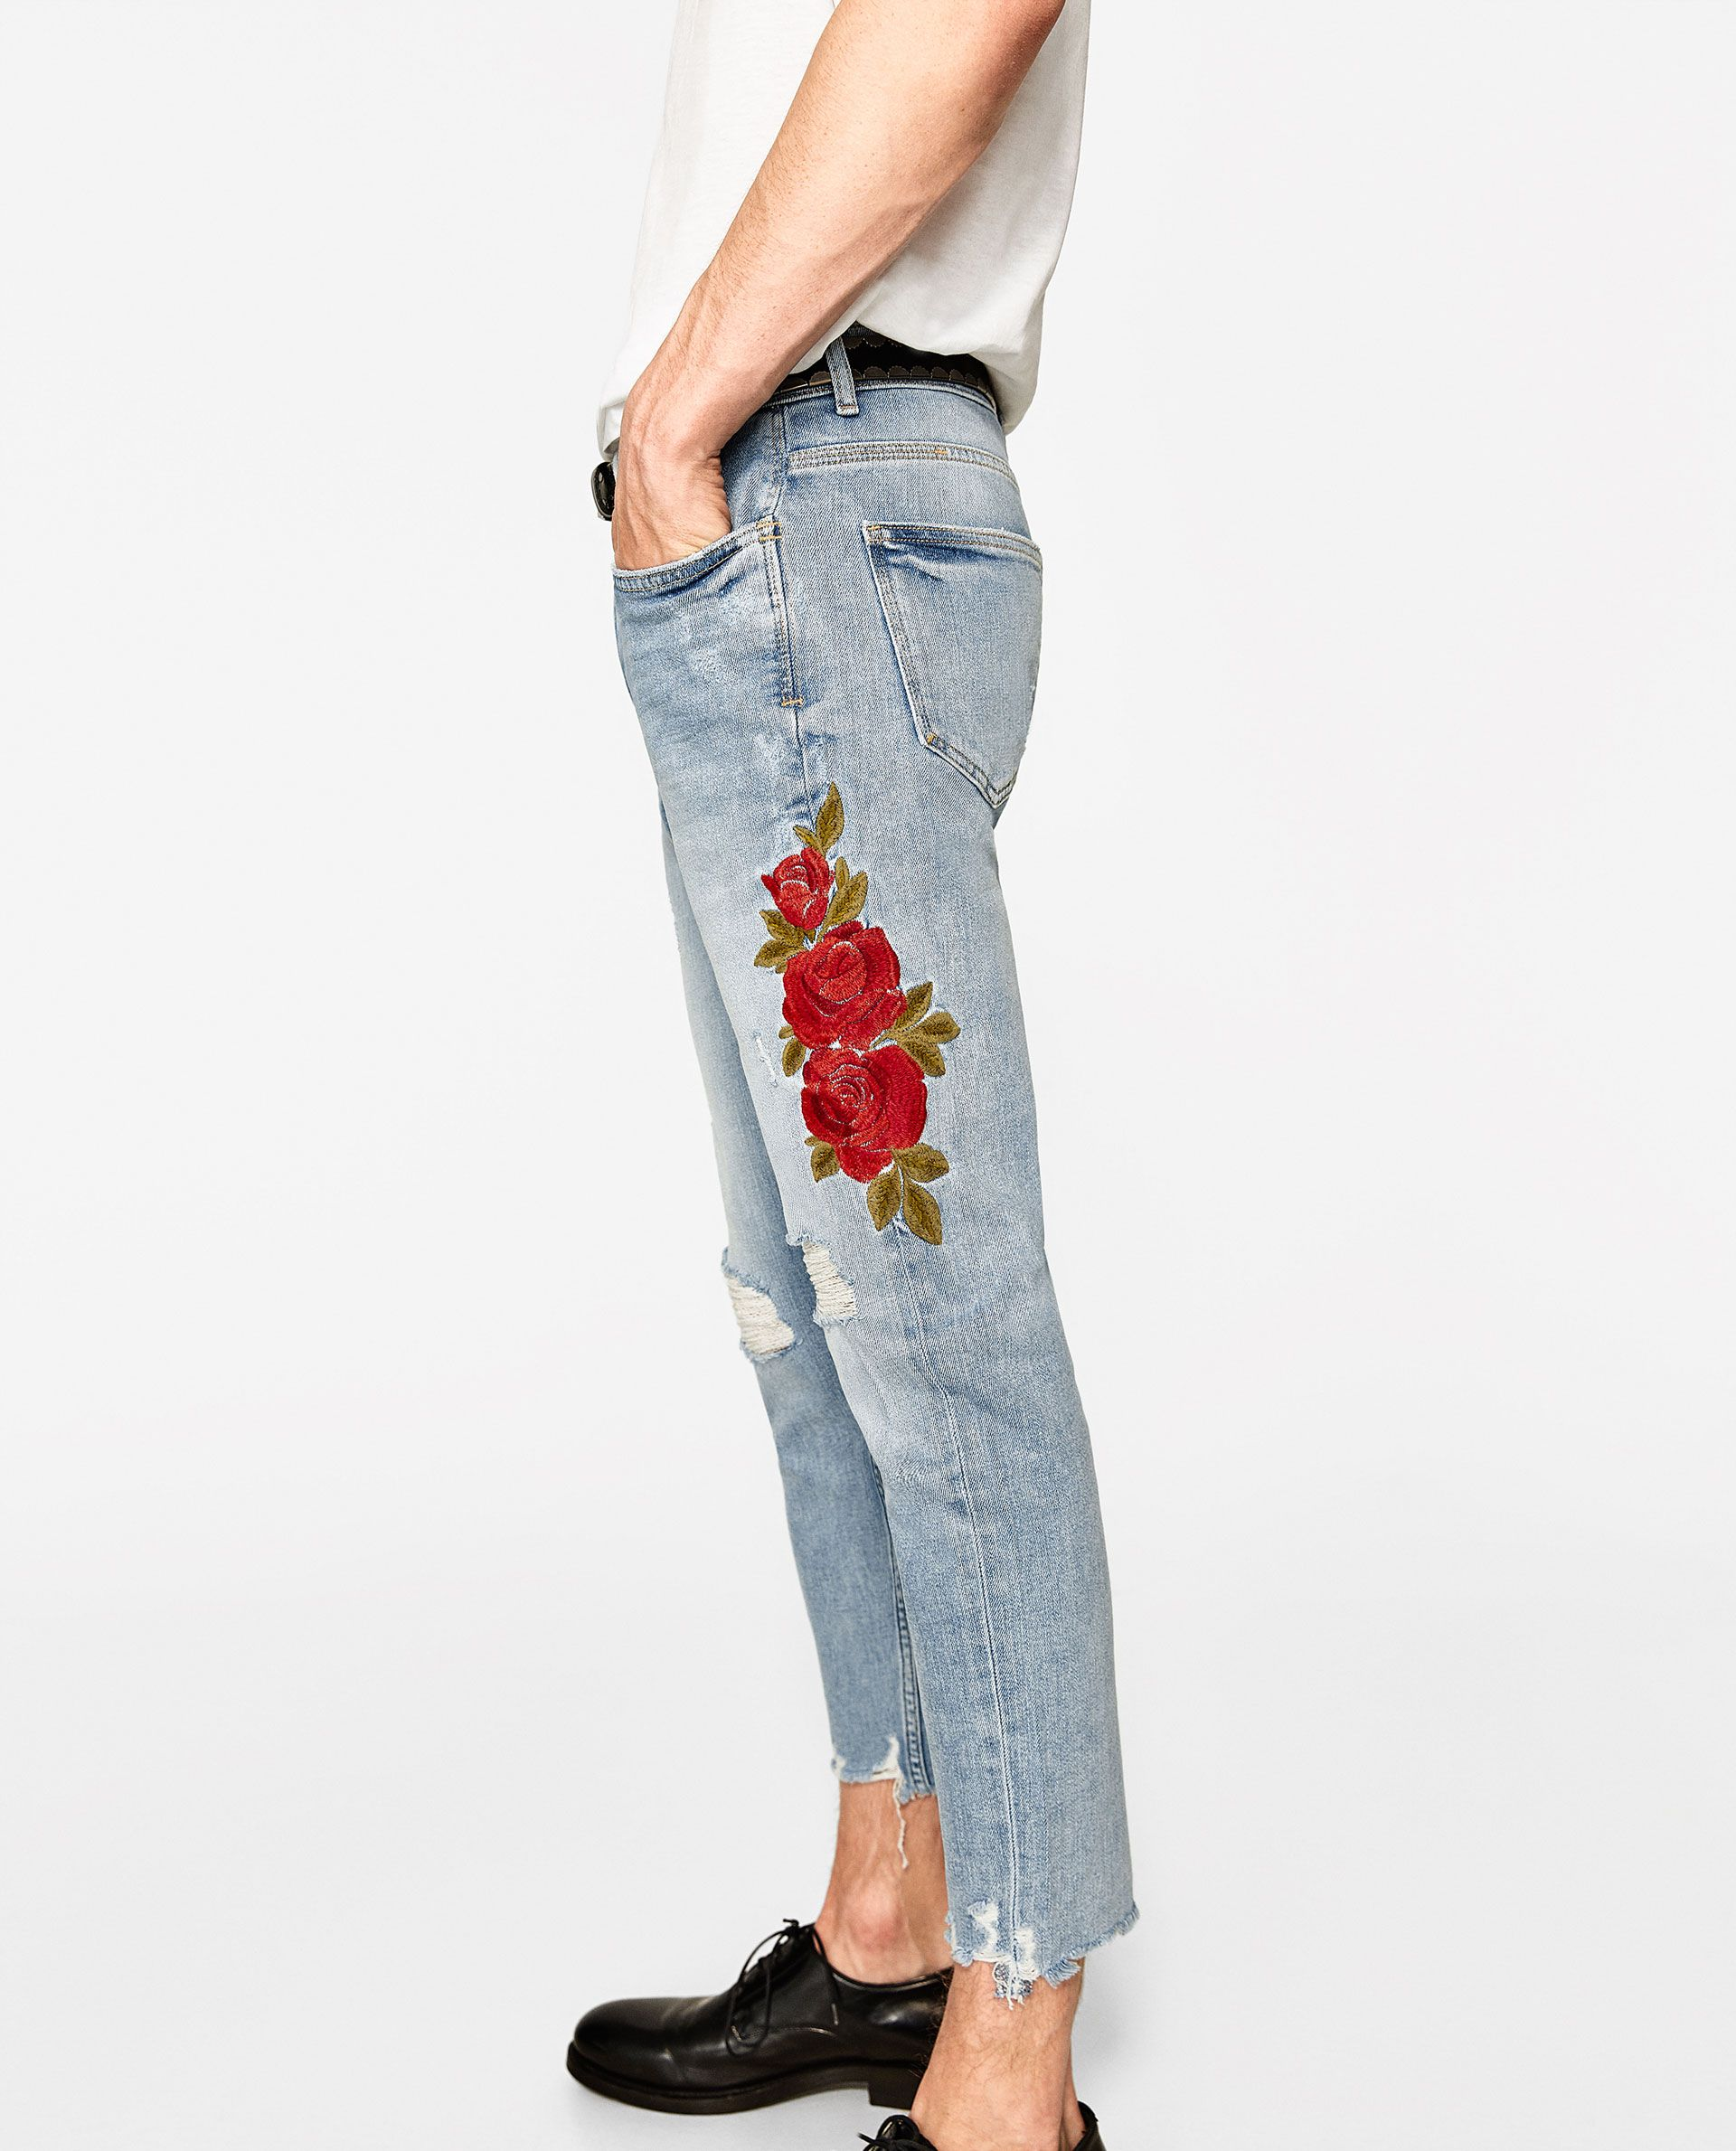 b620e9e4b0 ZARA Embroidered Jeans